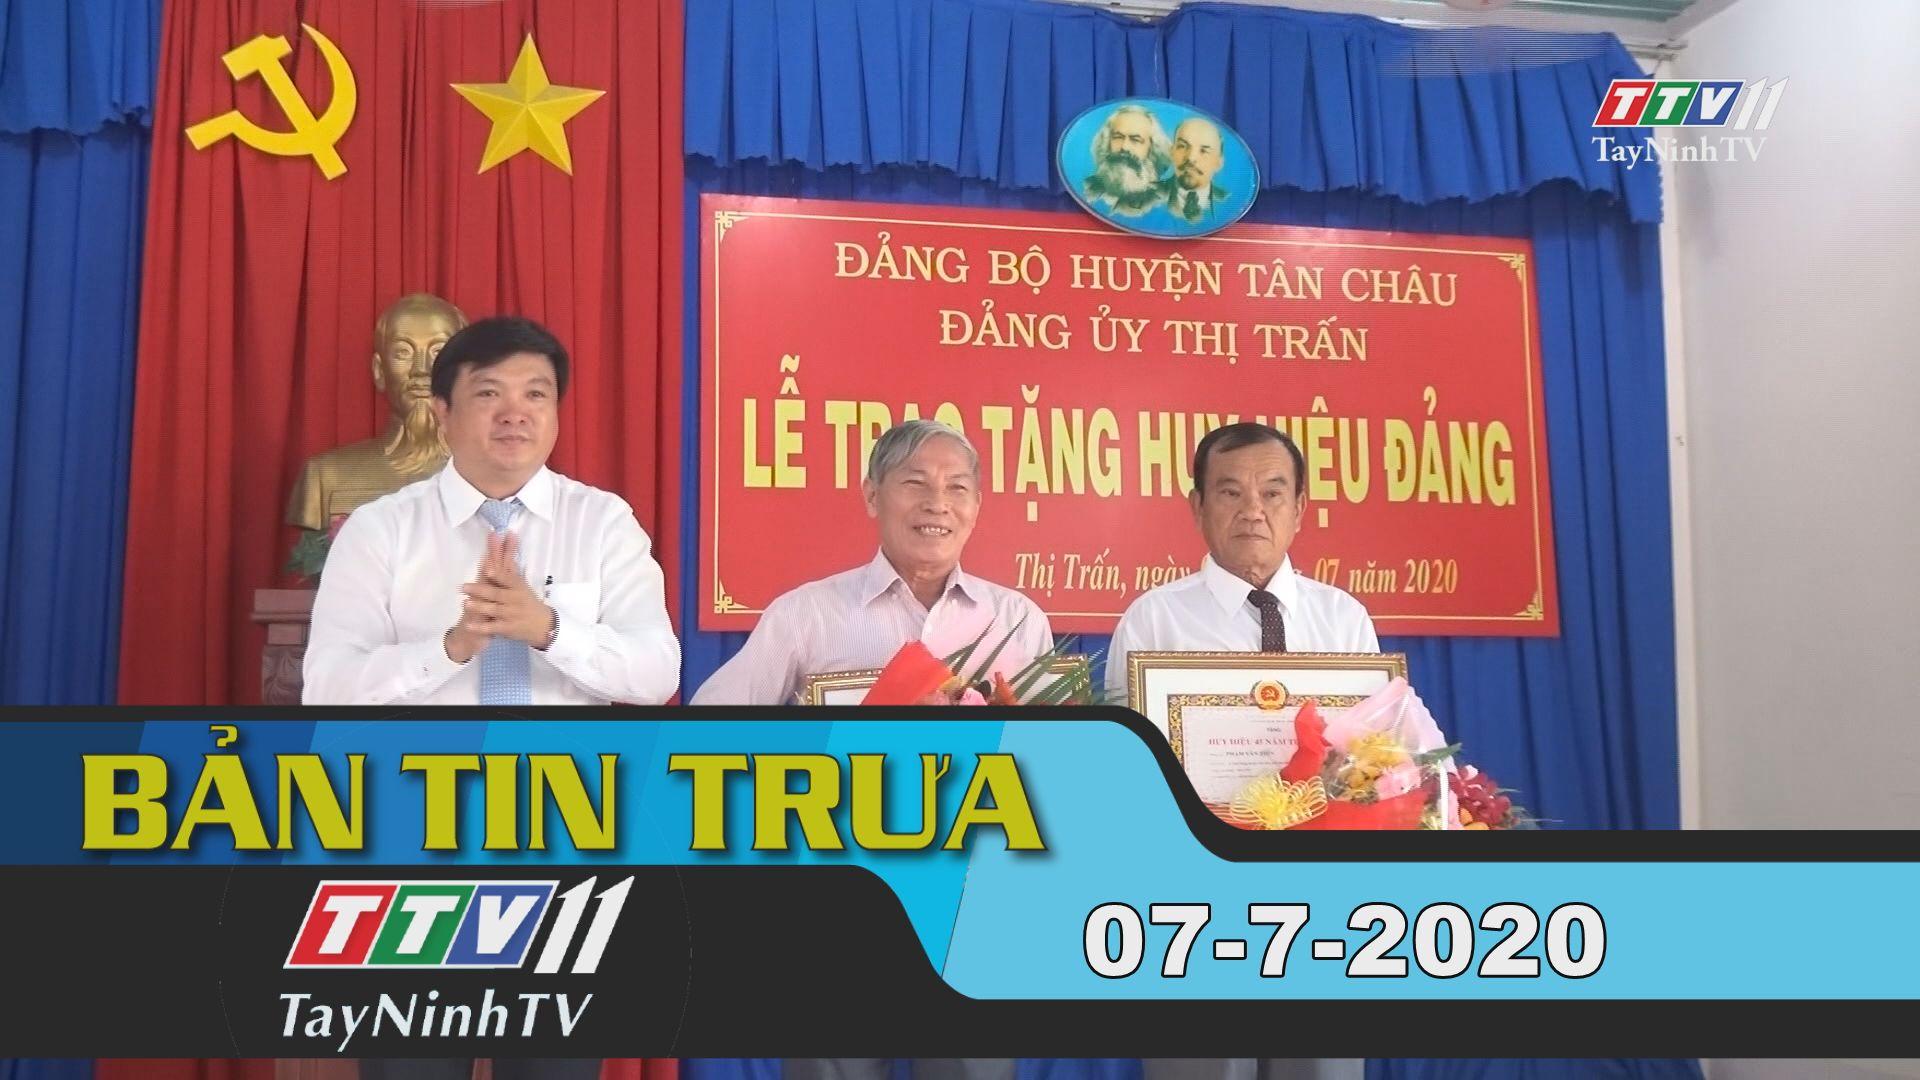 Bản tin trưa 07-7-2020 | Tin tức hôm nay | TayNinhTV